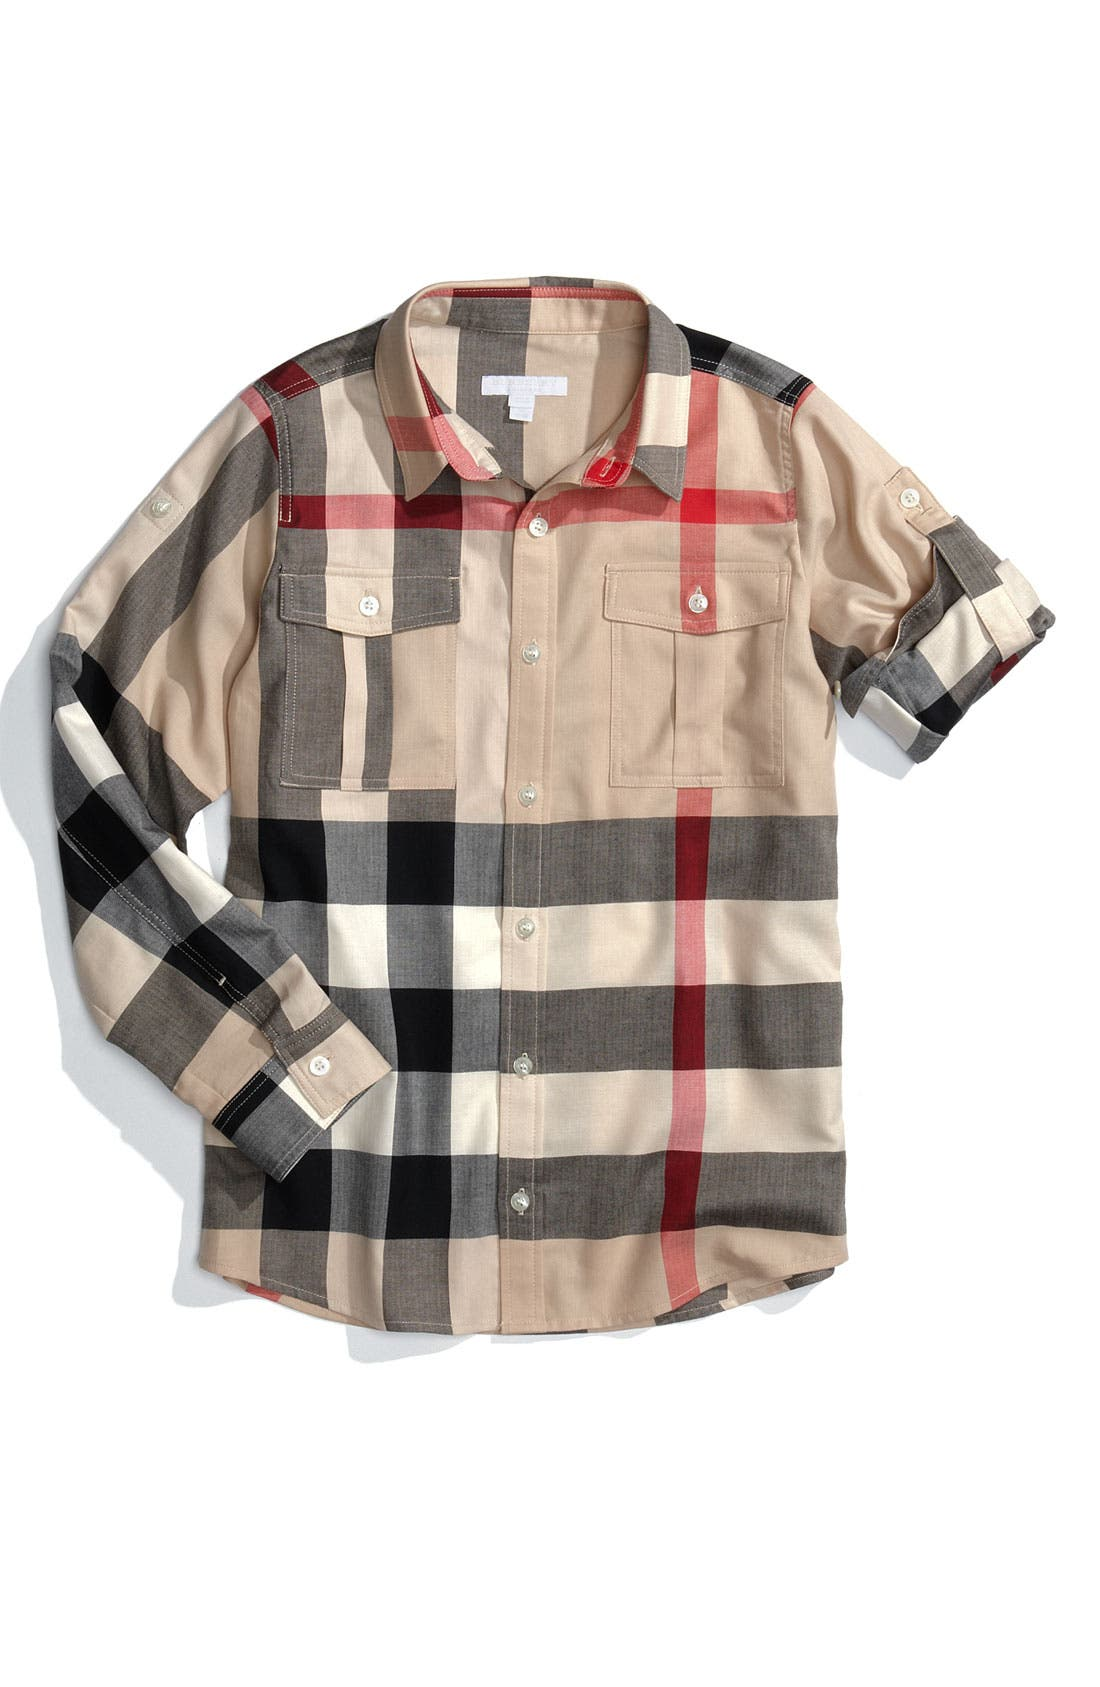 Alternate Image 1 Selected - Burberry Check Print Woven Shirt (Big Boys)